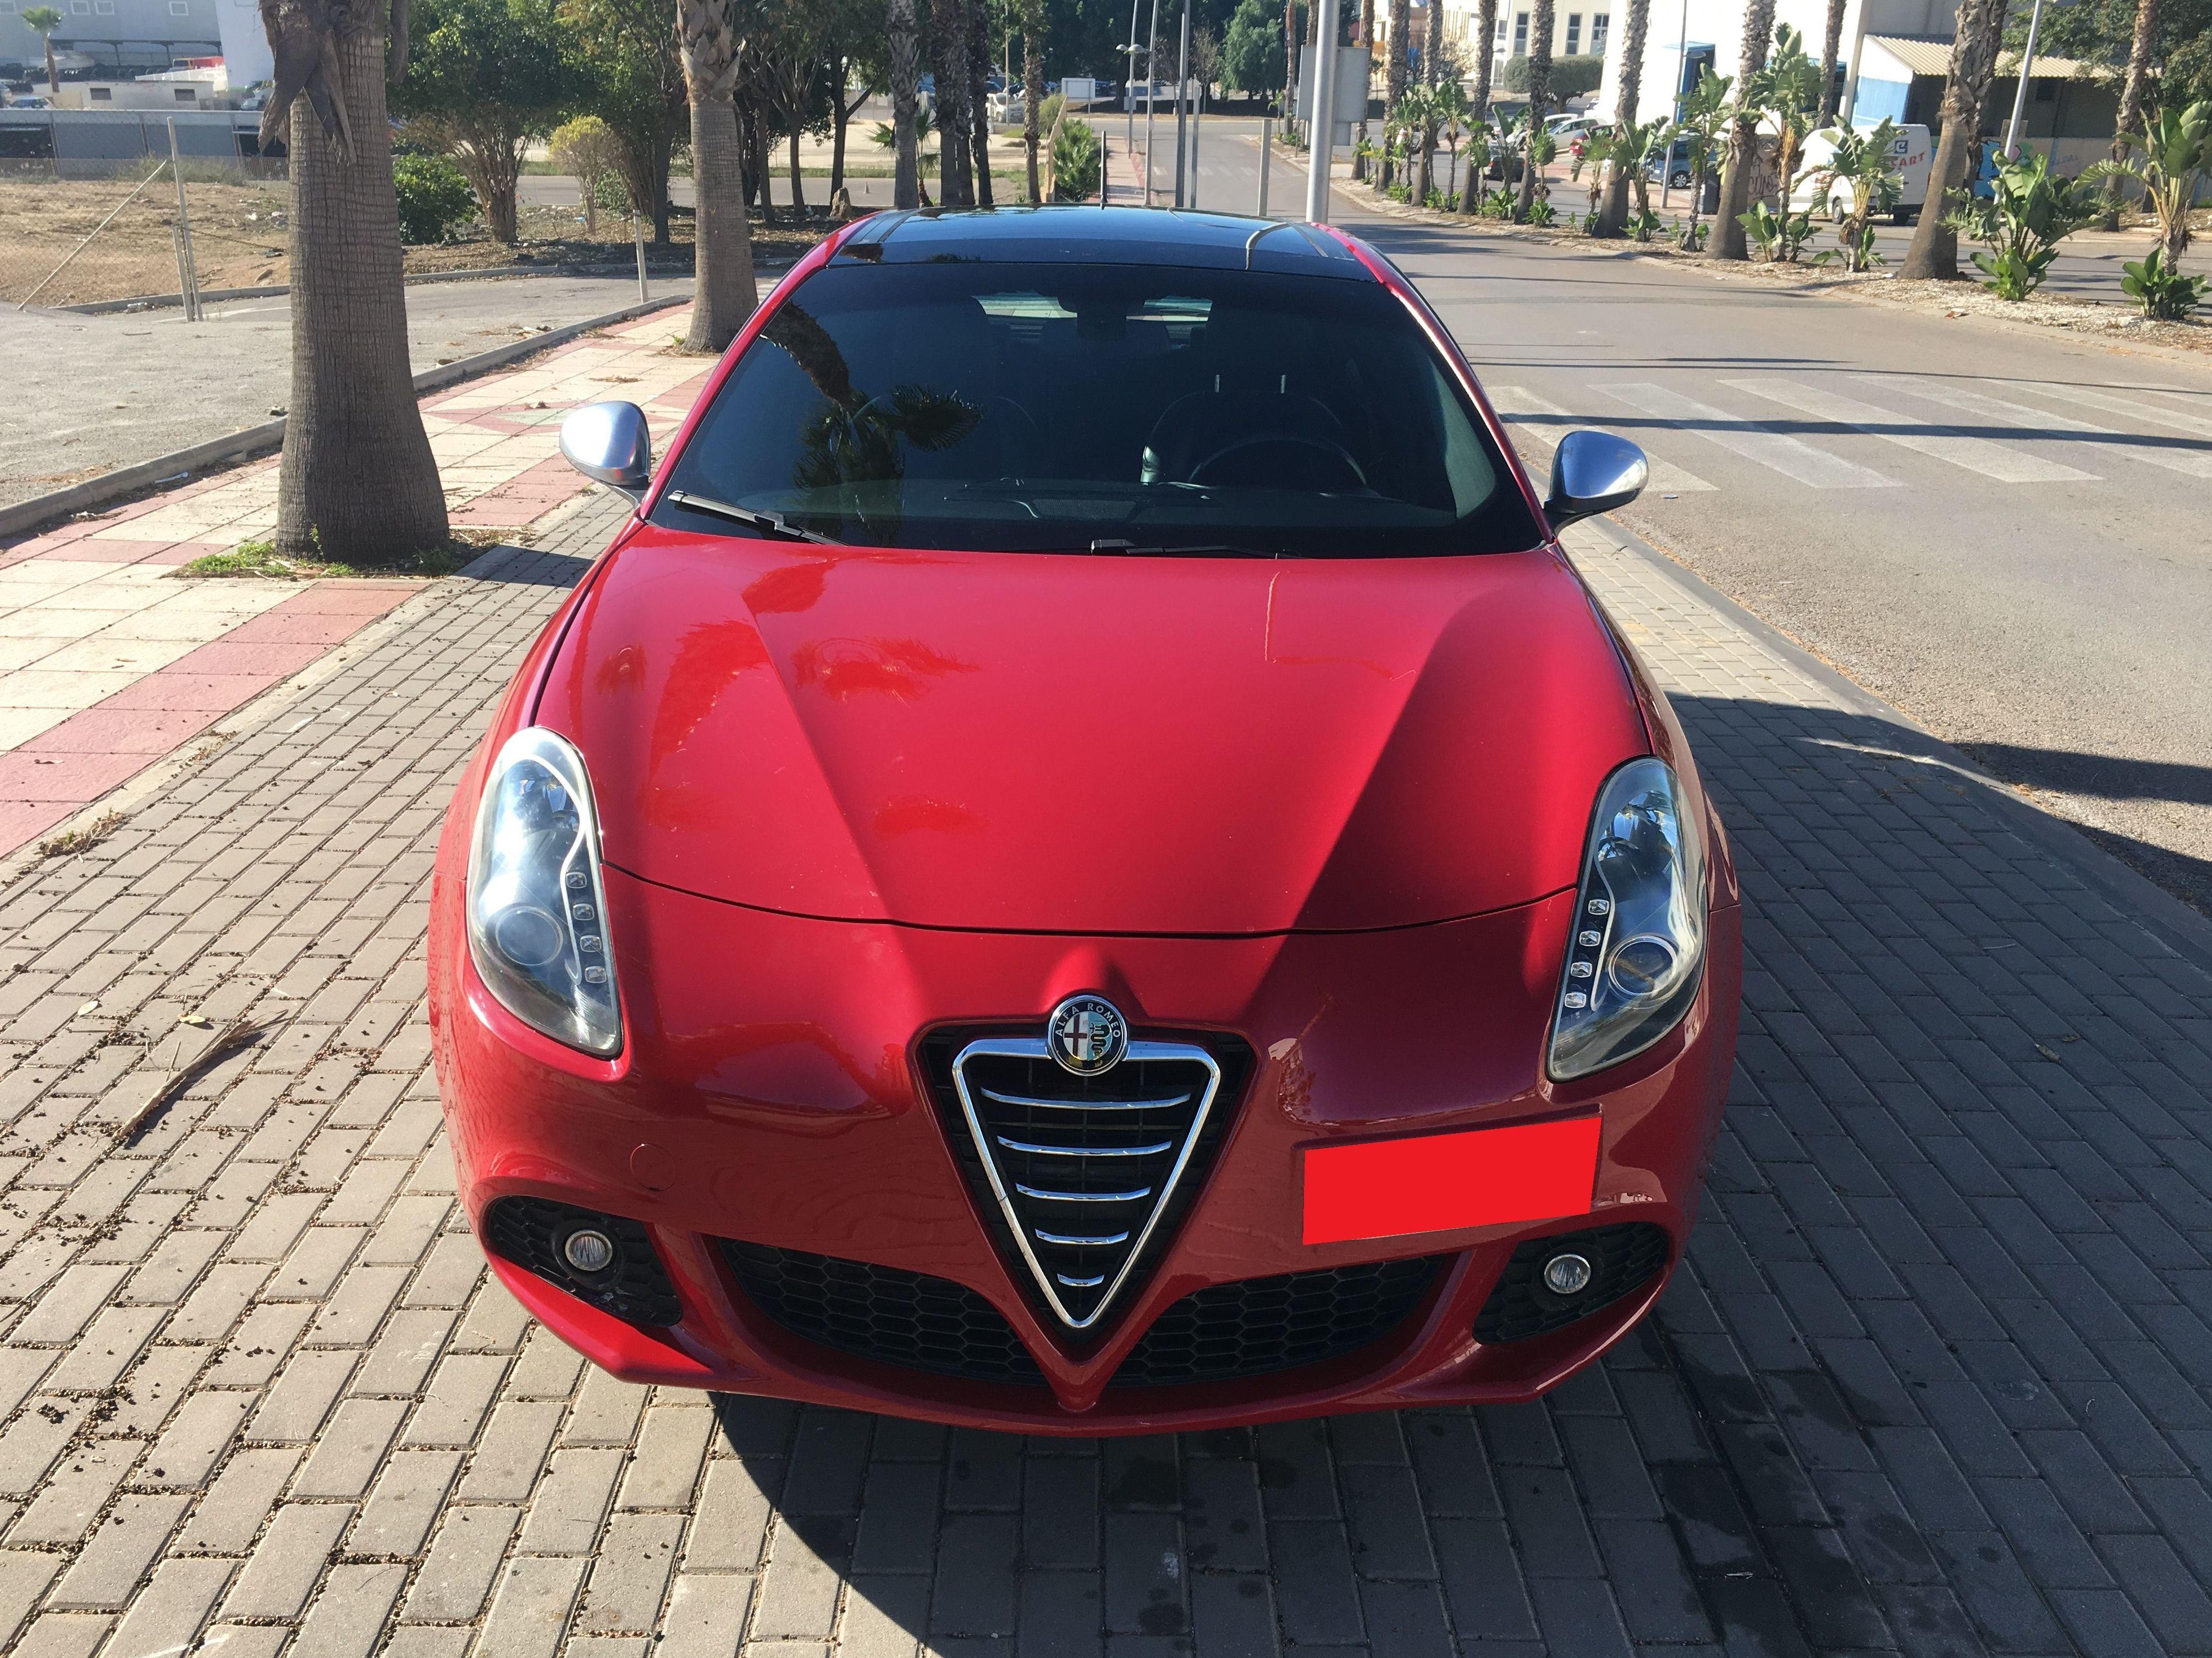 ALFA ROMEO GUILIETTA: COCHES DE OCASION de Navirent-Automóviles Parque Mediterráneo